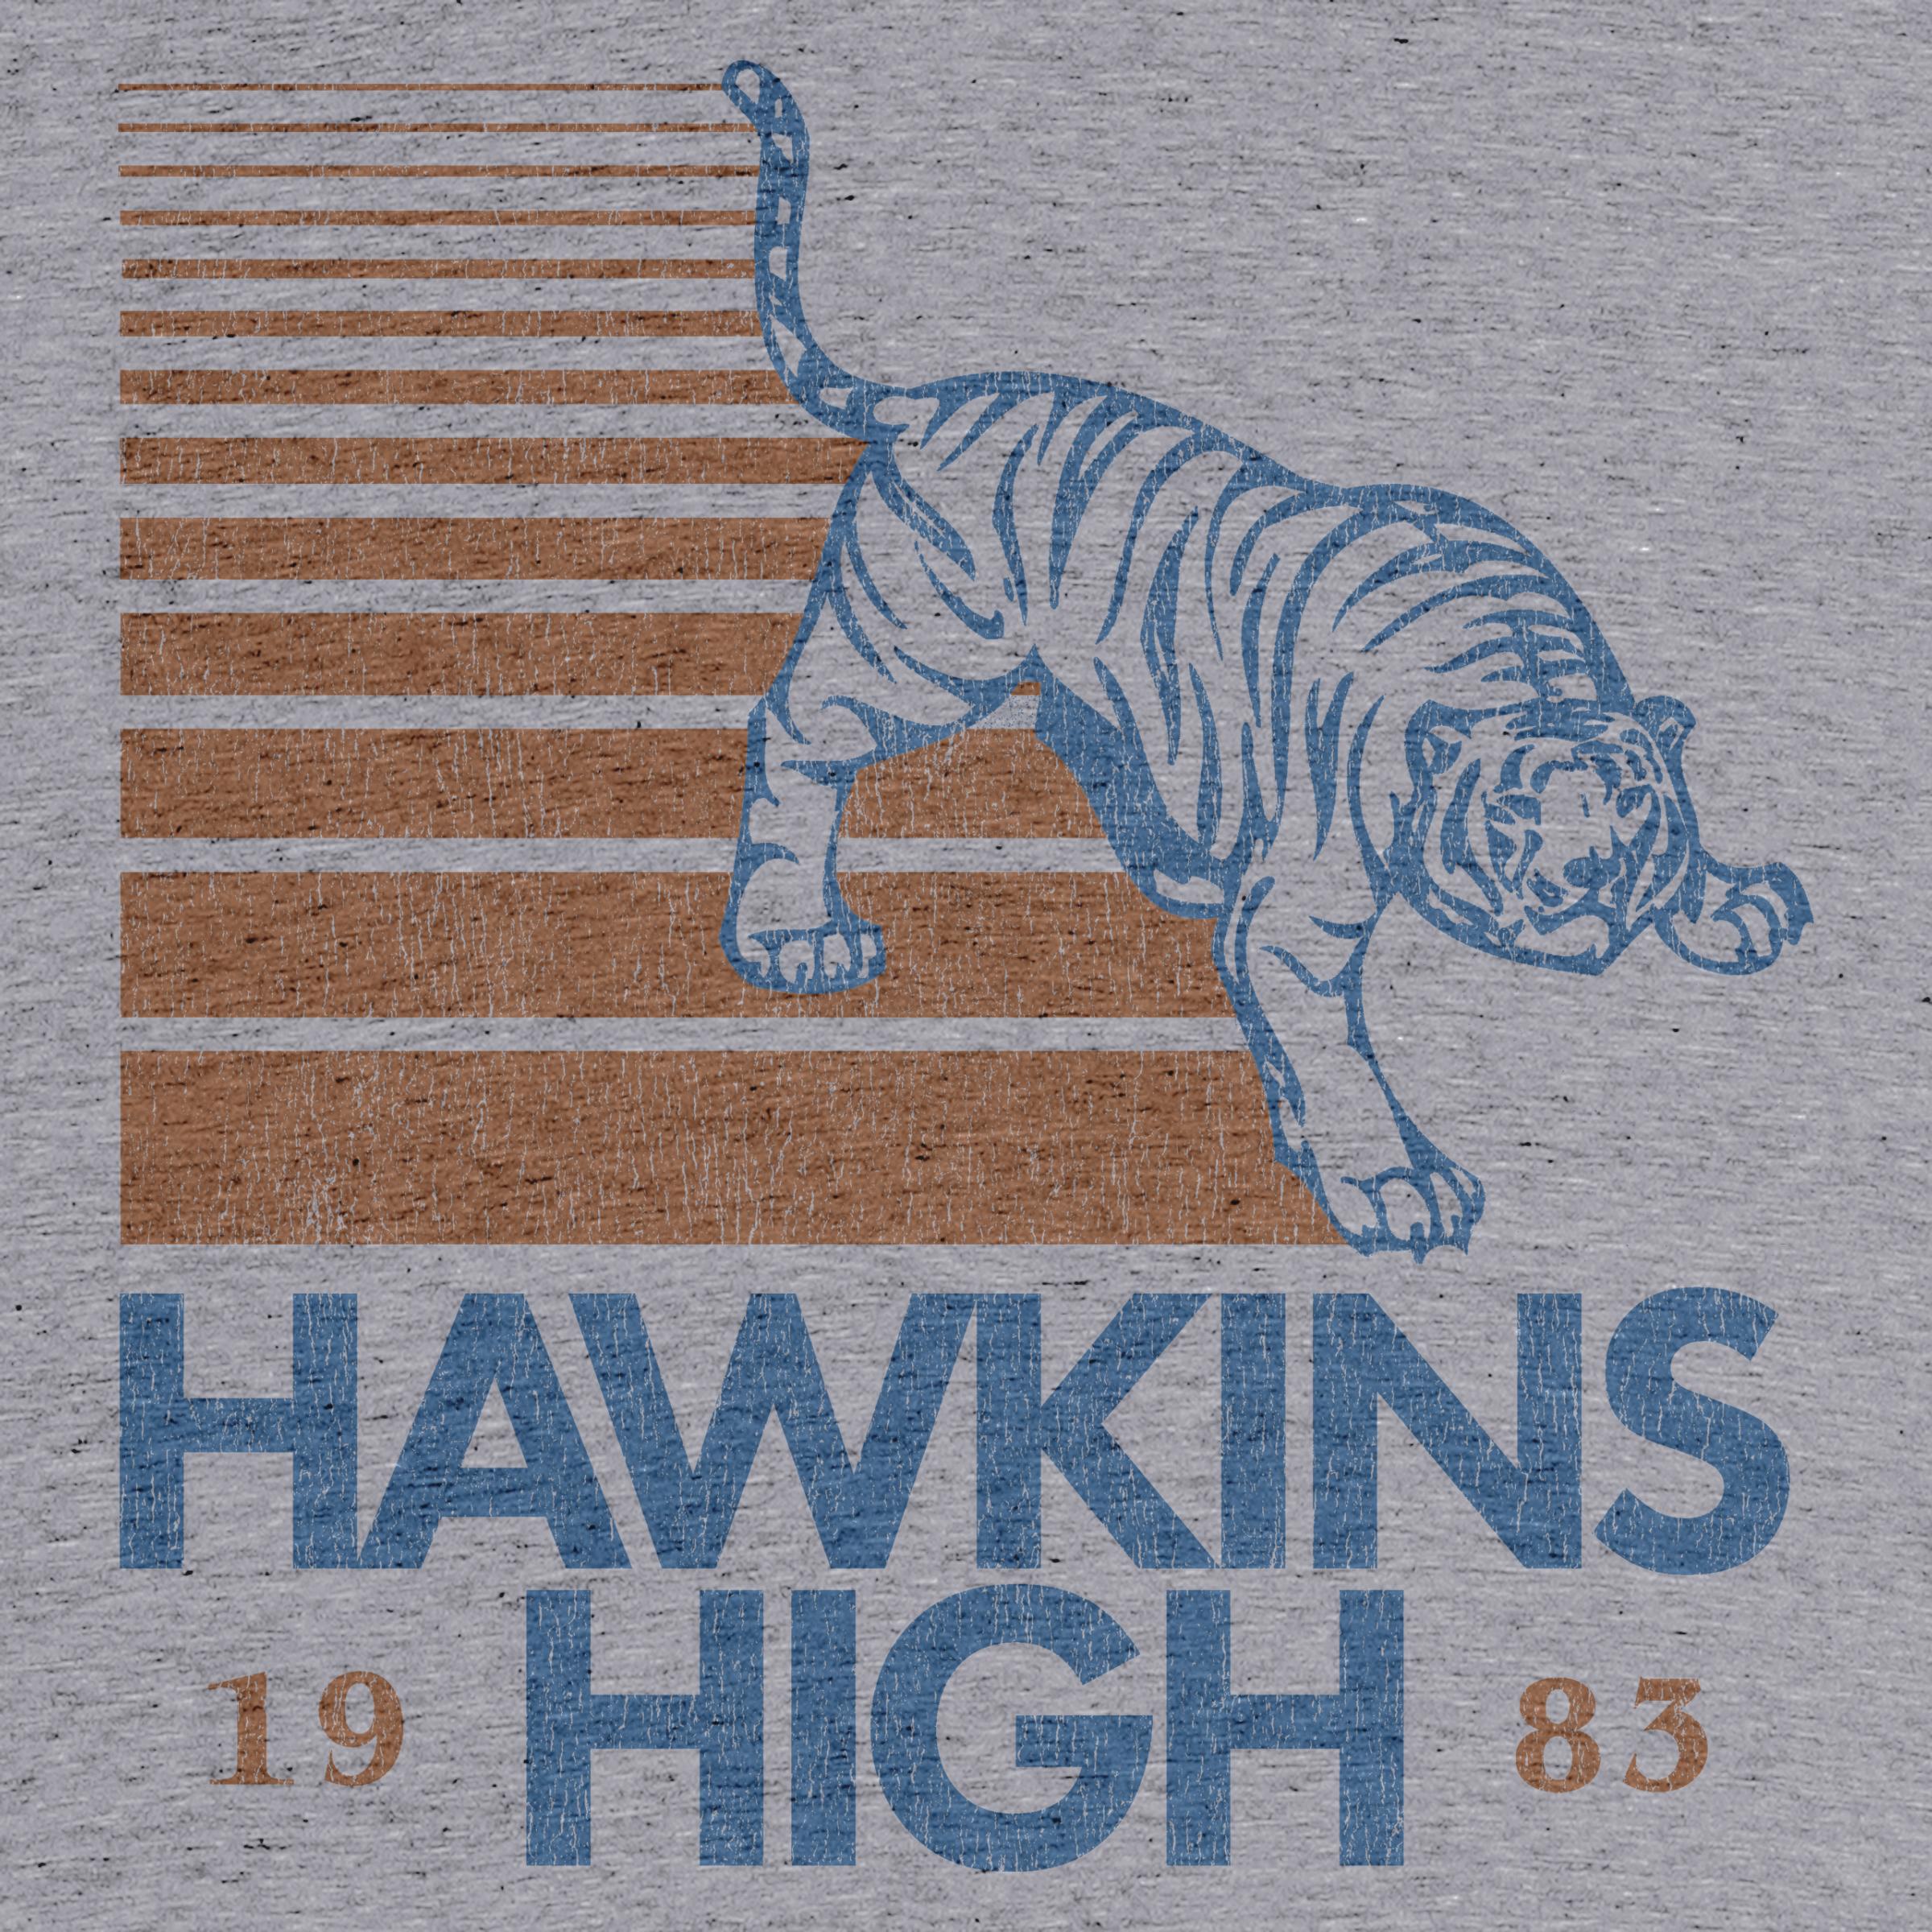 Hawkins High